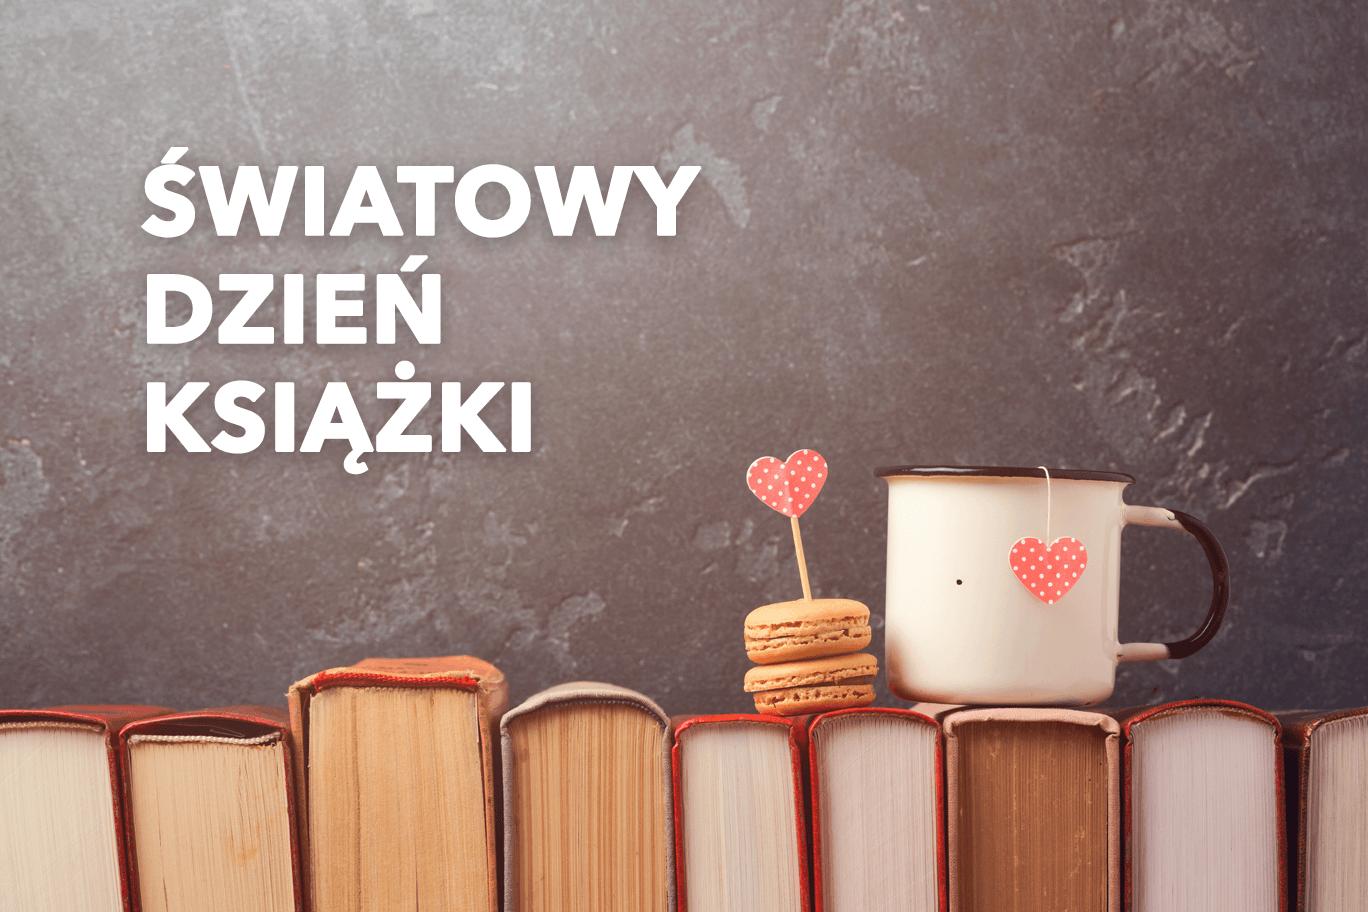 Kup książkę w Biedronce i wygraj telefon iPhone 12 Pro Max!